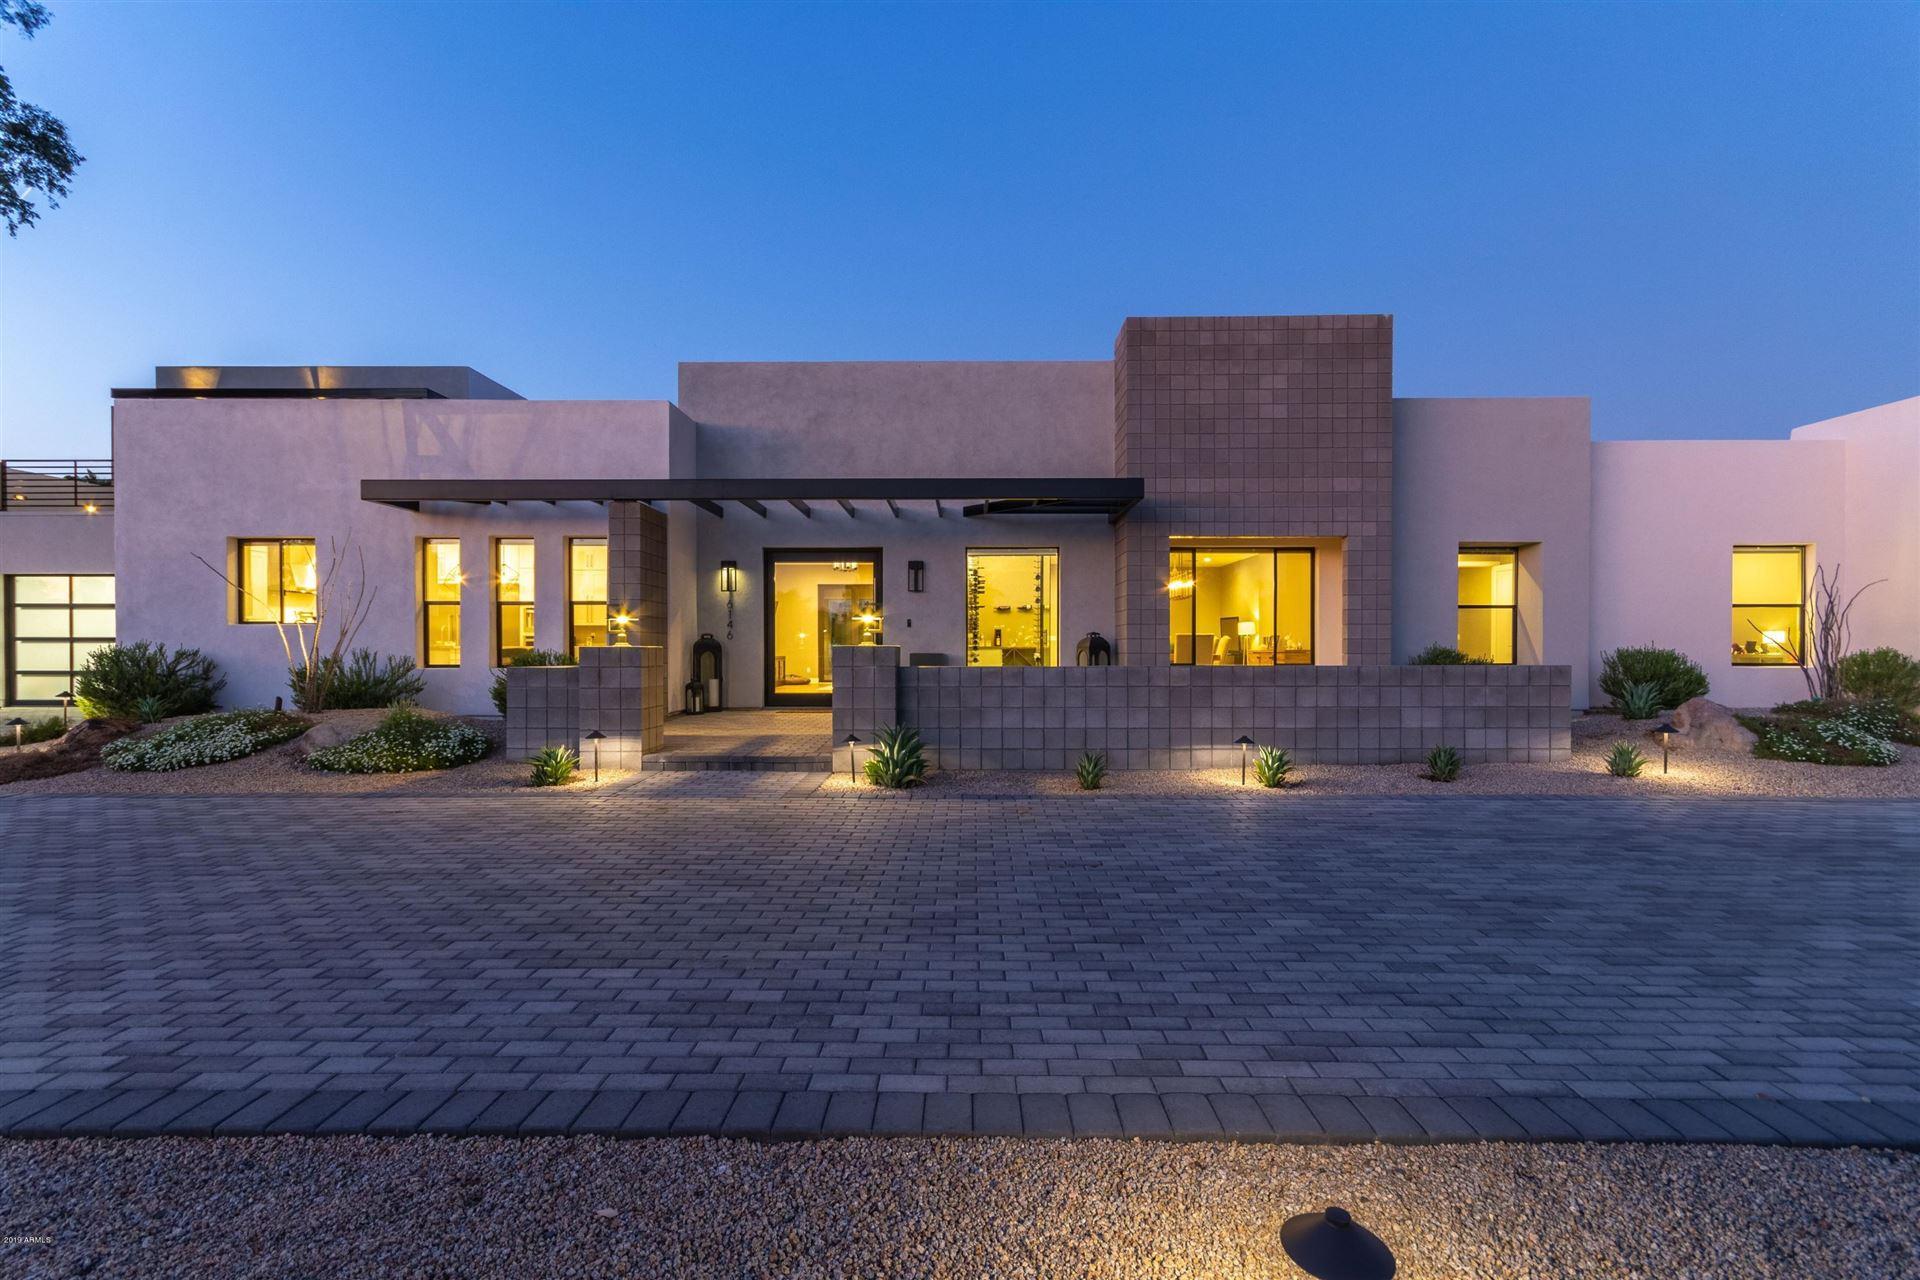 6146 E GOLD DUST Avenue, Paradise Valley, AZ 85253 - #: 6019717